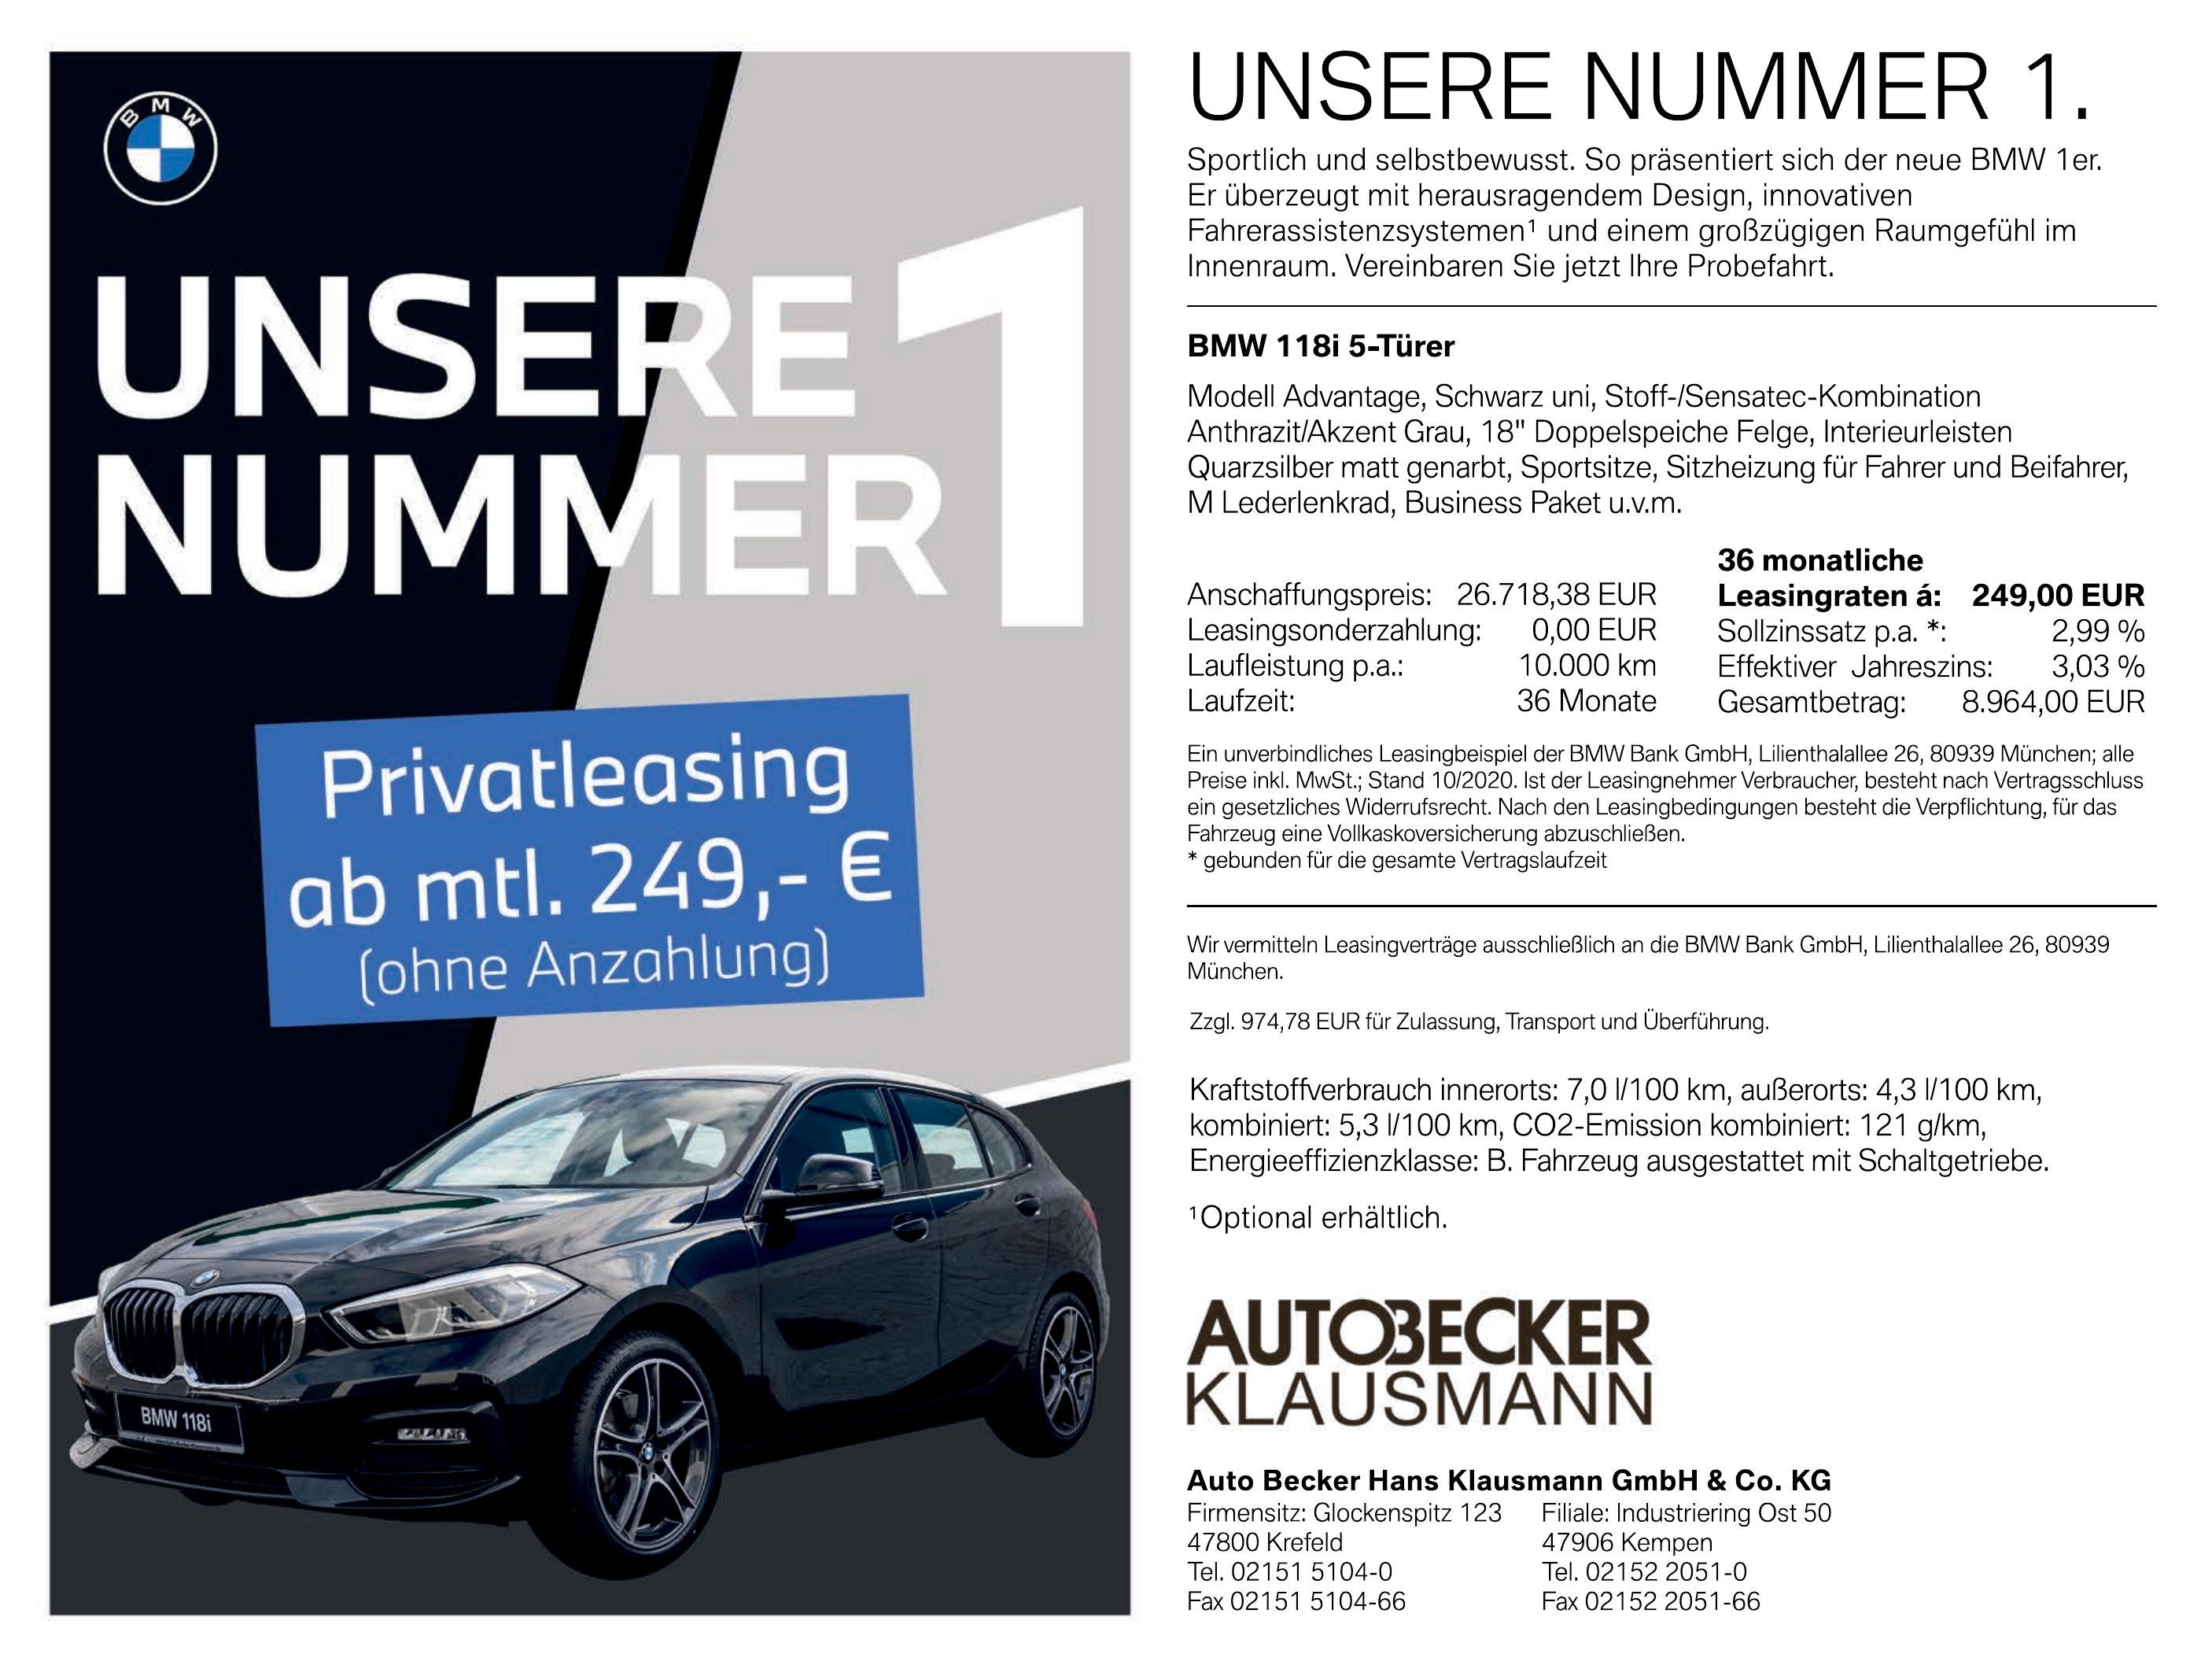 Auto Becker Hans Klausmann GmbH & Co. KG